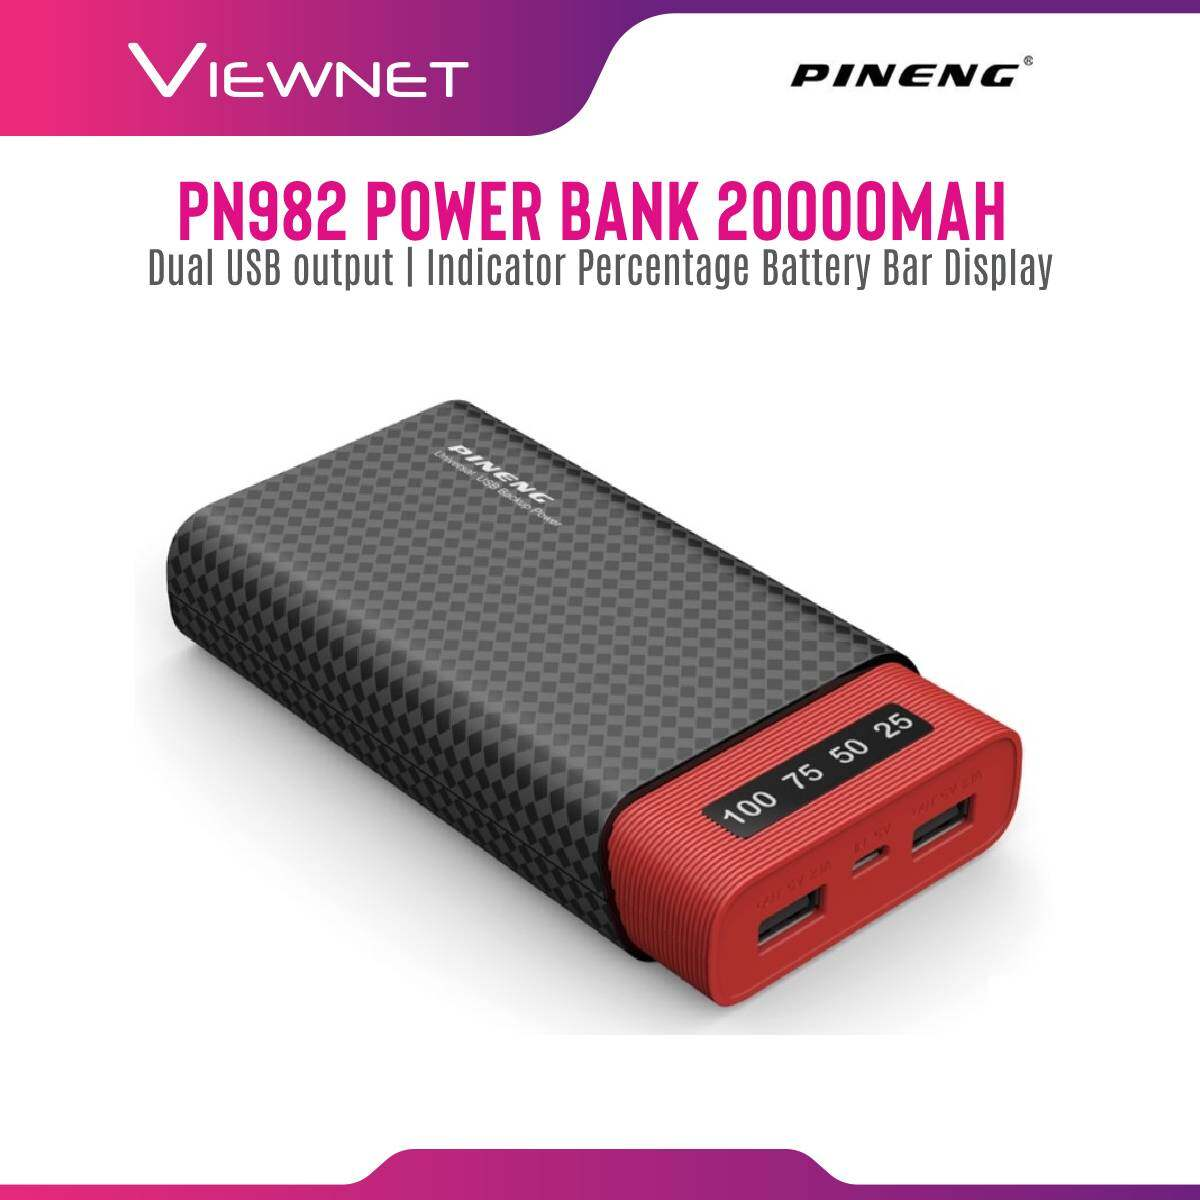 Pineng 20000mAh Power Bank (PN-982), 2-Out 2.1A, Slim and Lightweight, Dual USB Output